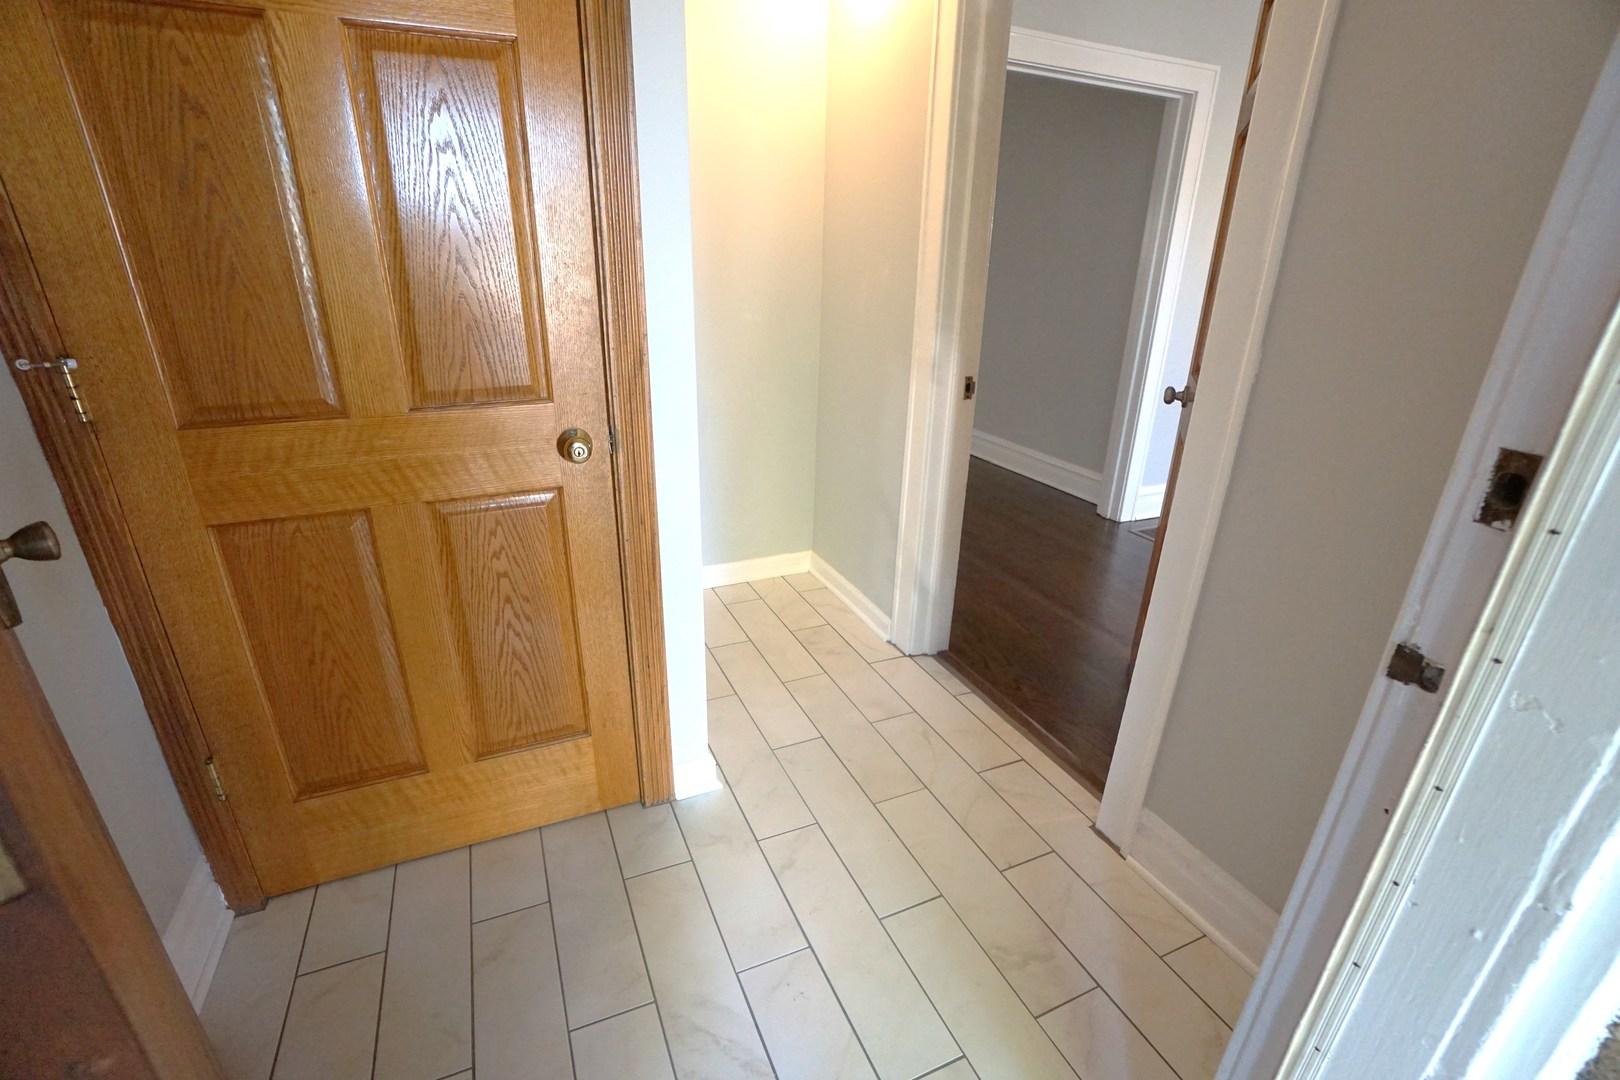 4344 north marmora avenue chicago il 60634 jproctor for Kitchen cabinets 01089